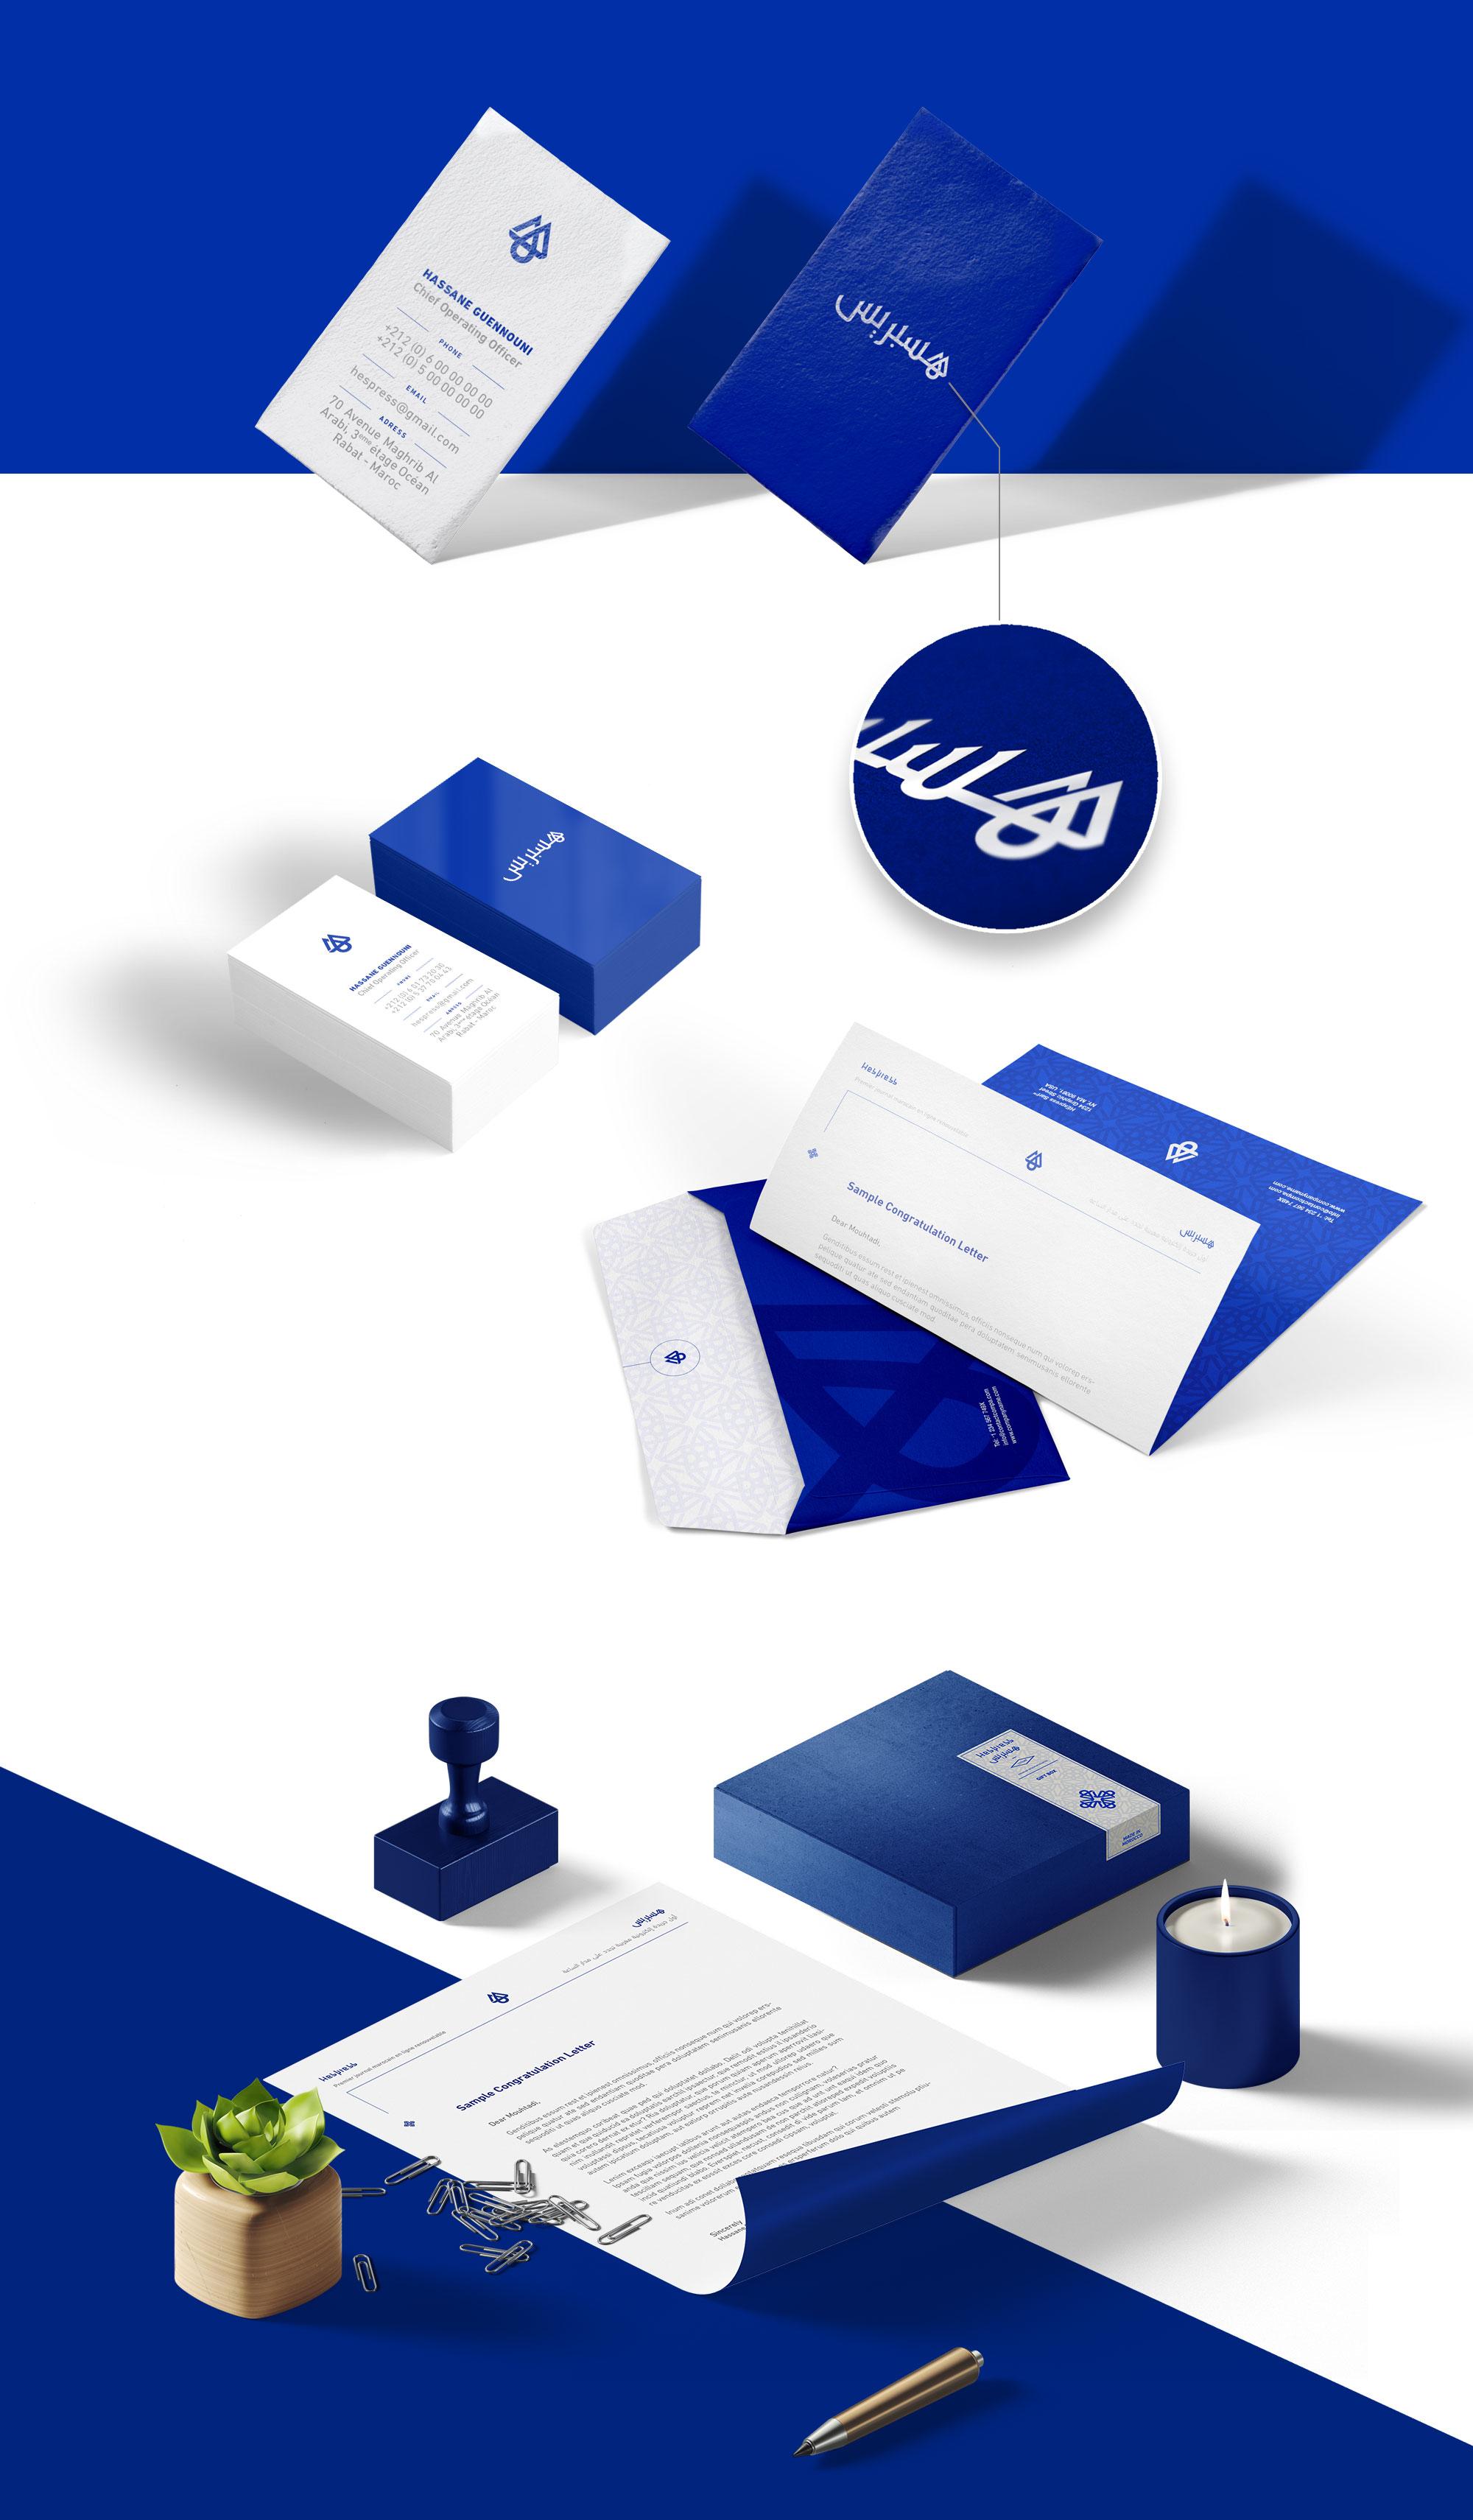 branding-hespress-logo-corporate-design-mouhtadi-design_06